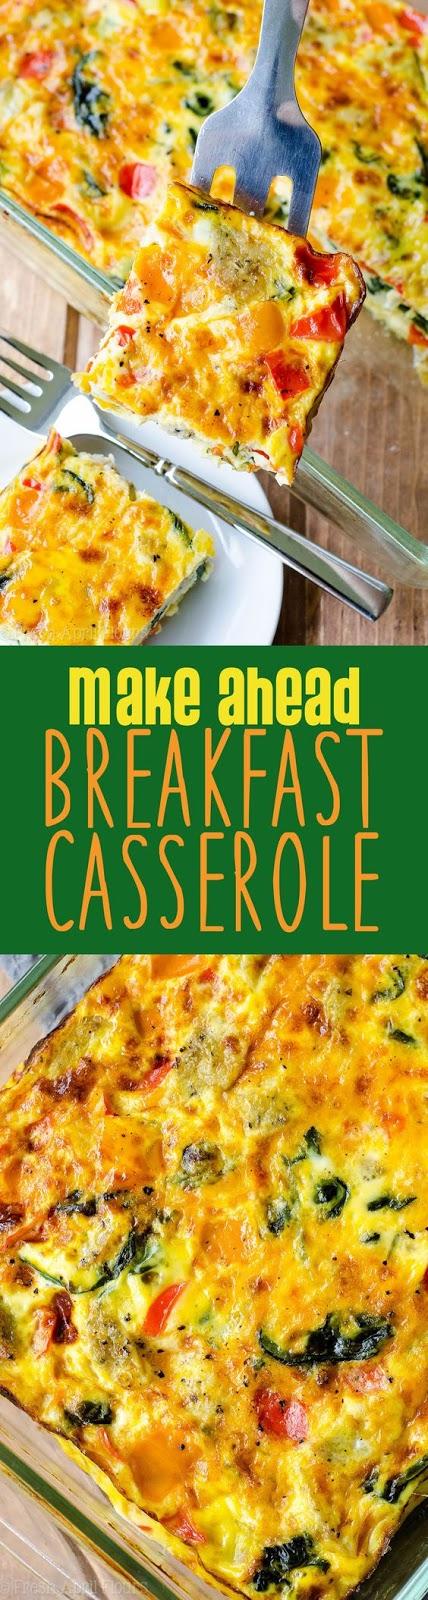 Photo of Make Ahead Meal: Breakfast Casserole – Hulubalang Recipes